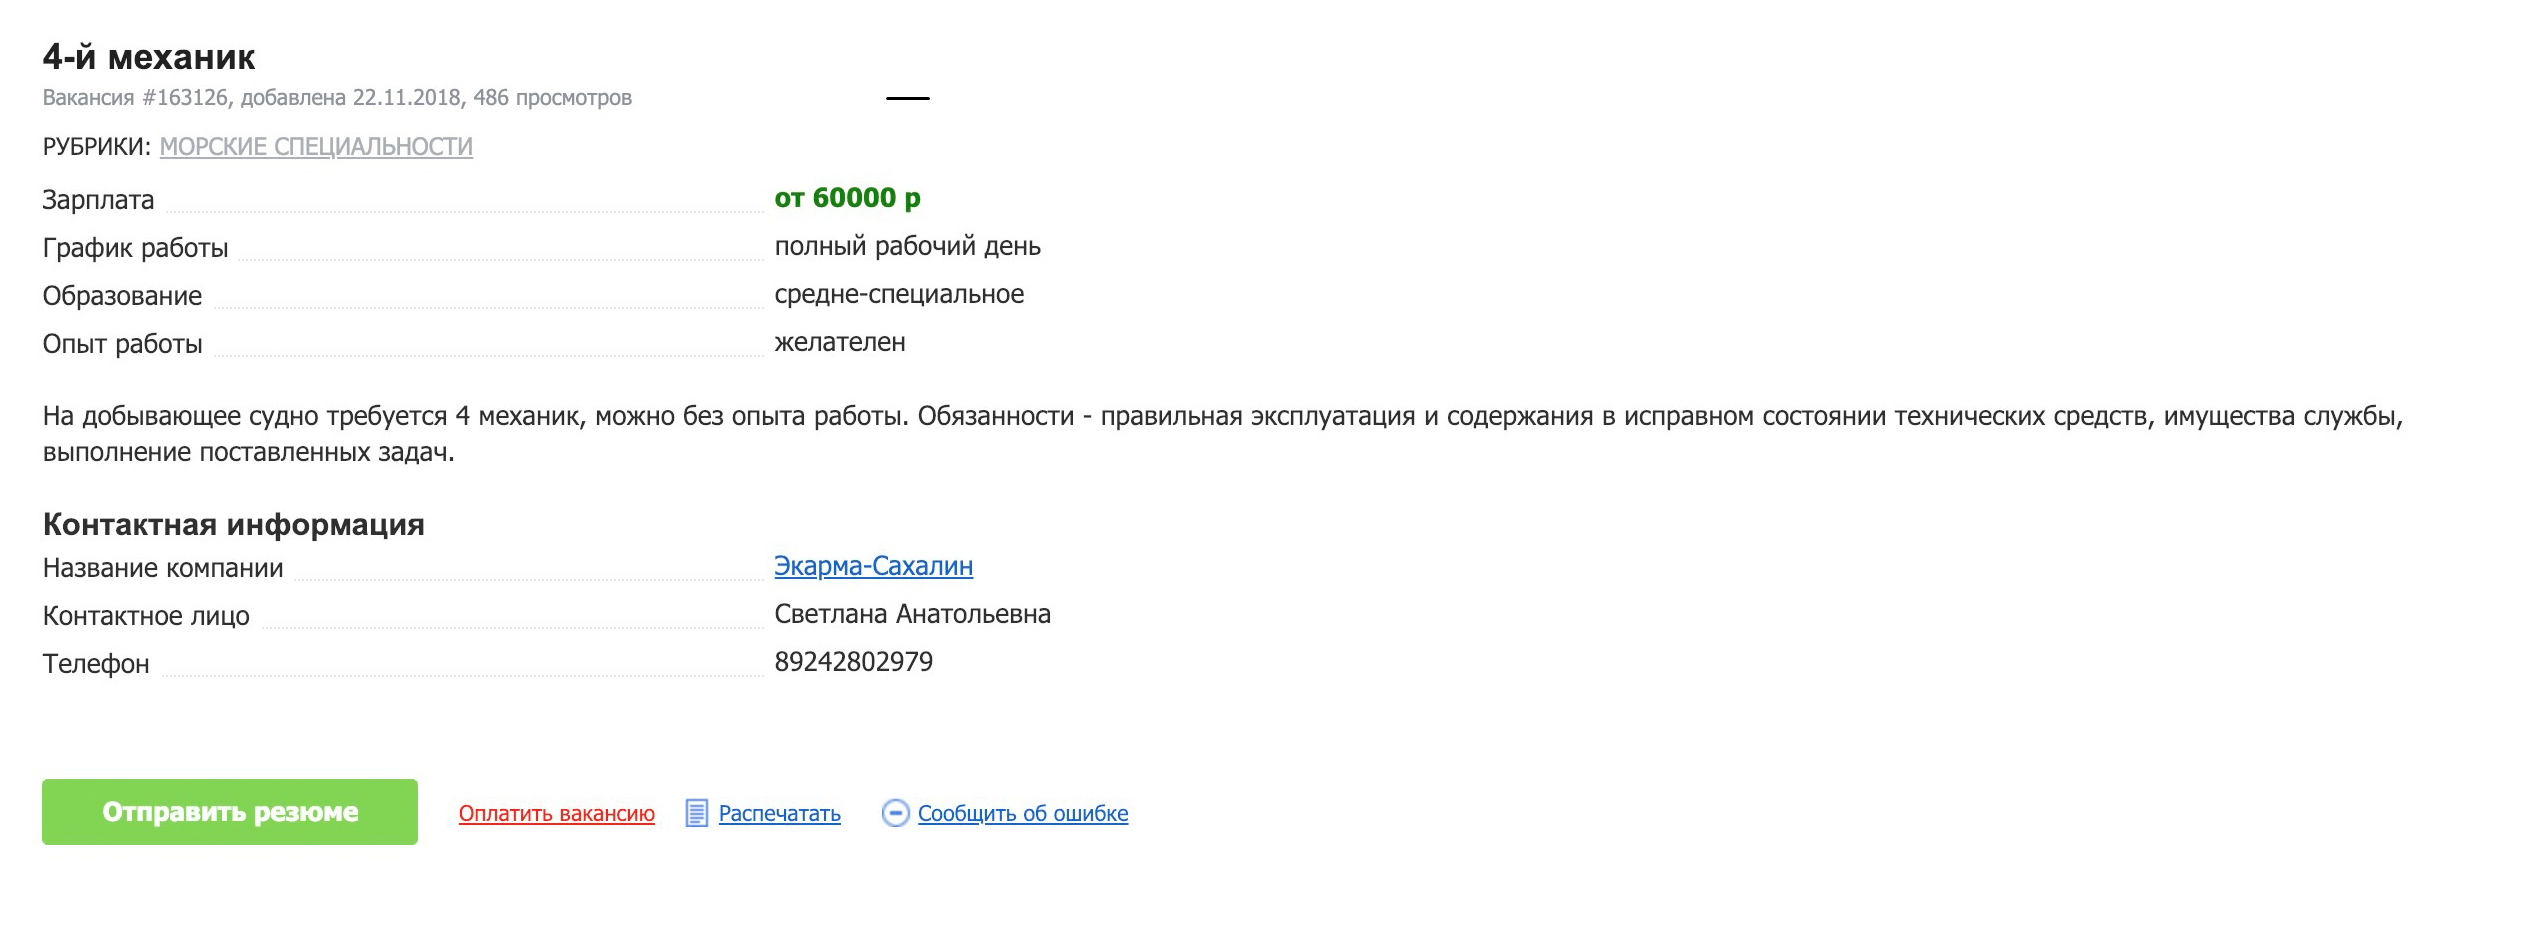 Судовому механику — 60 000 р.